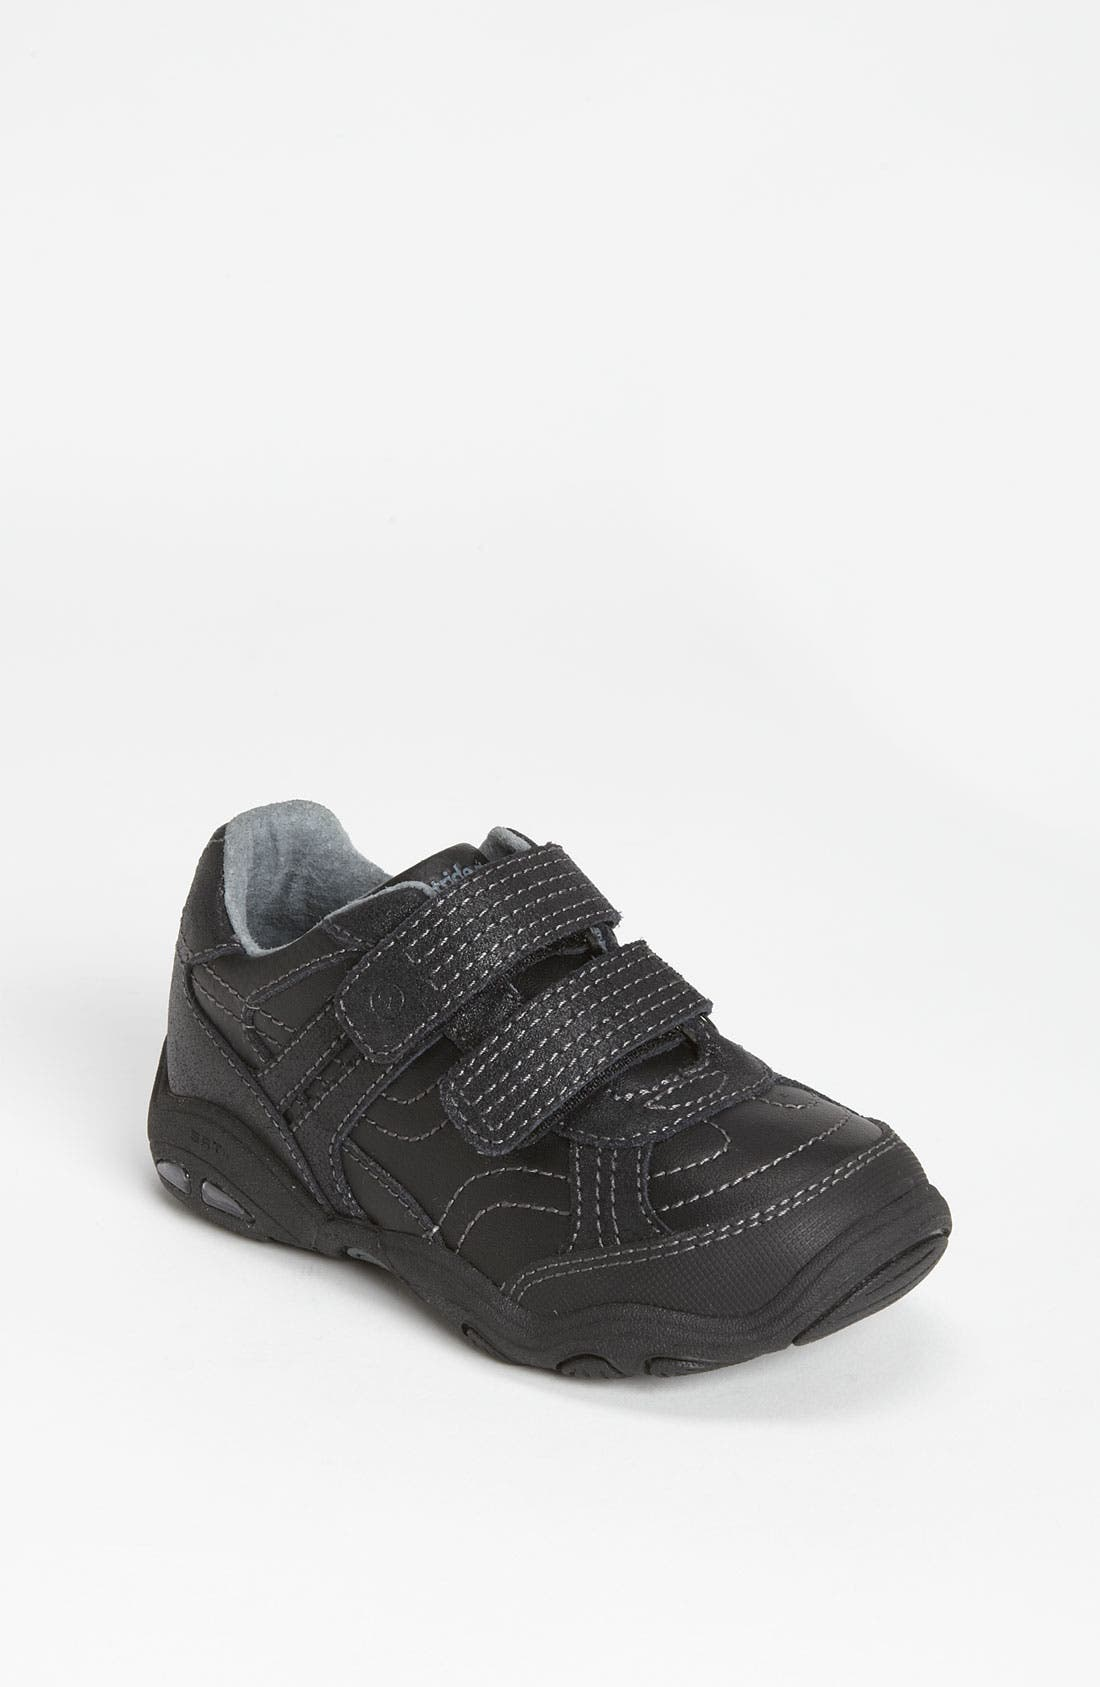 Main Image - Stride Rite 'Baxter' Sneaker (Toddler & Little Kid)